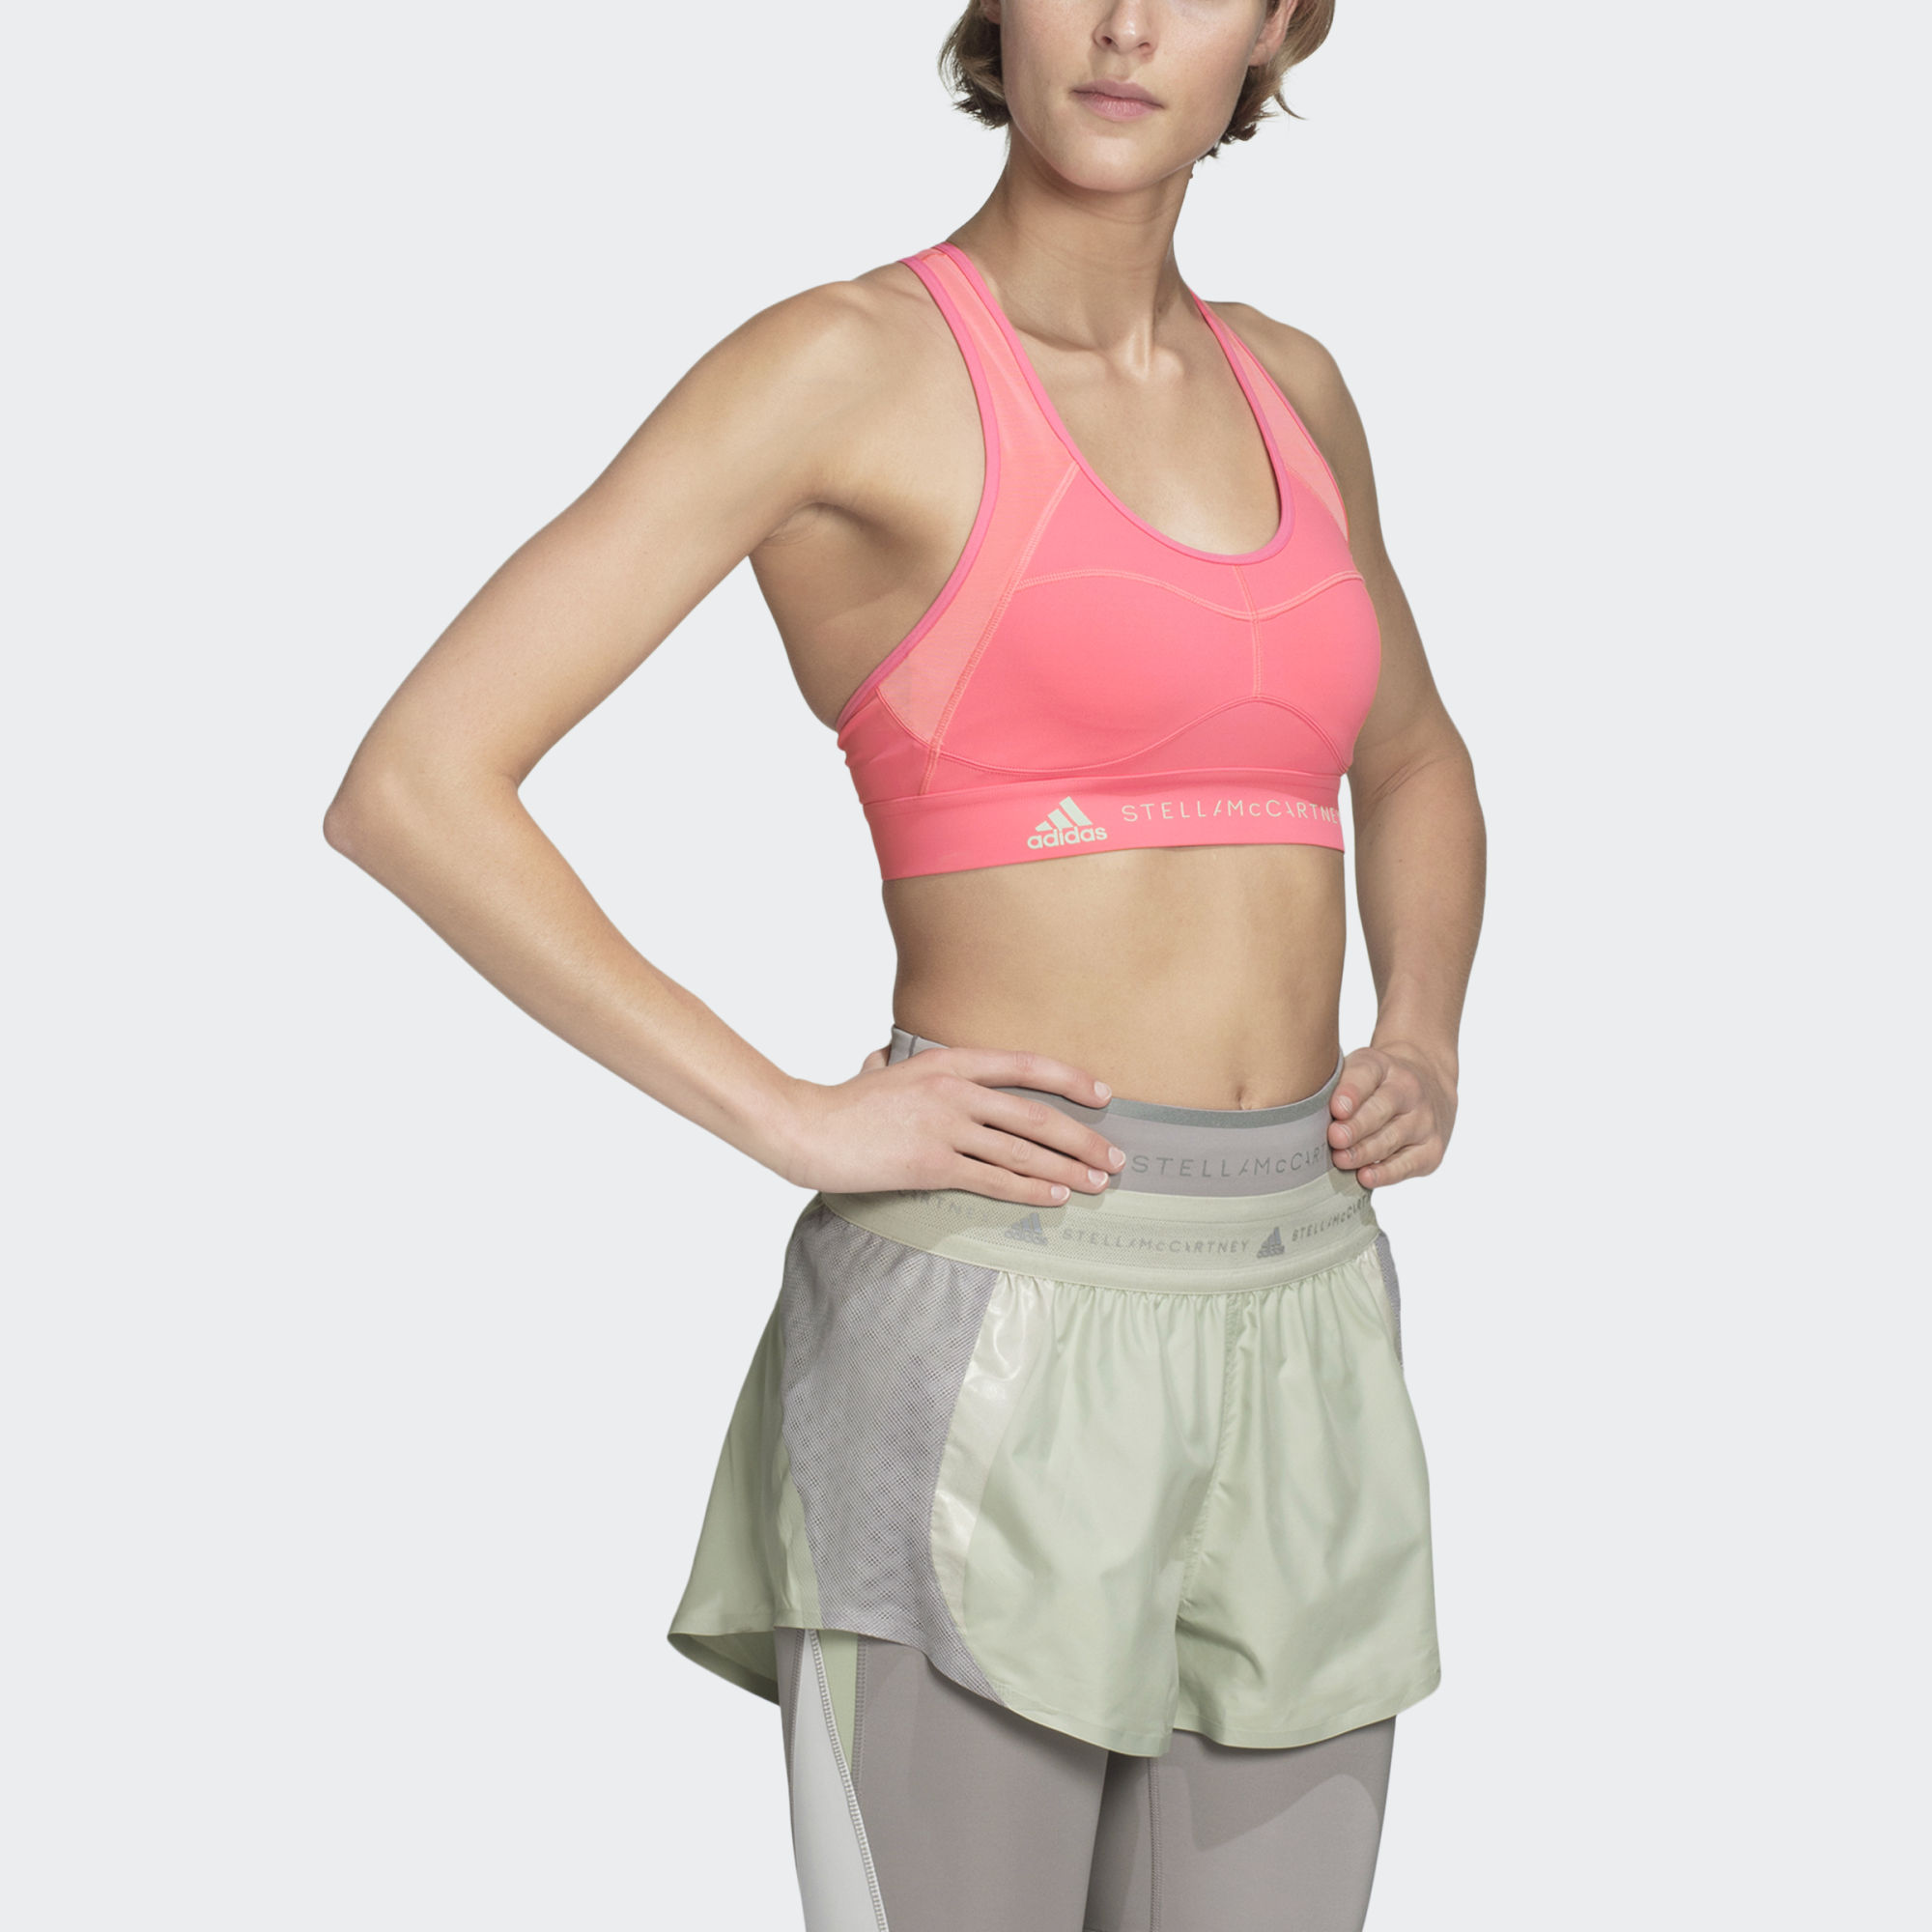 Versatile Training Bra in pink